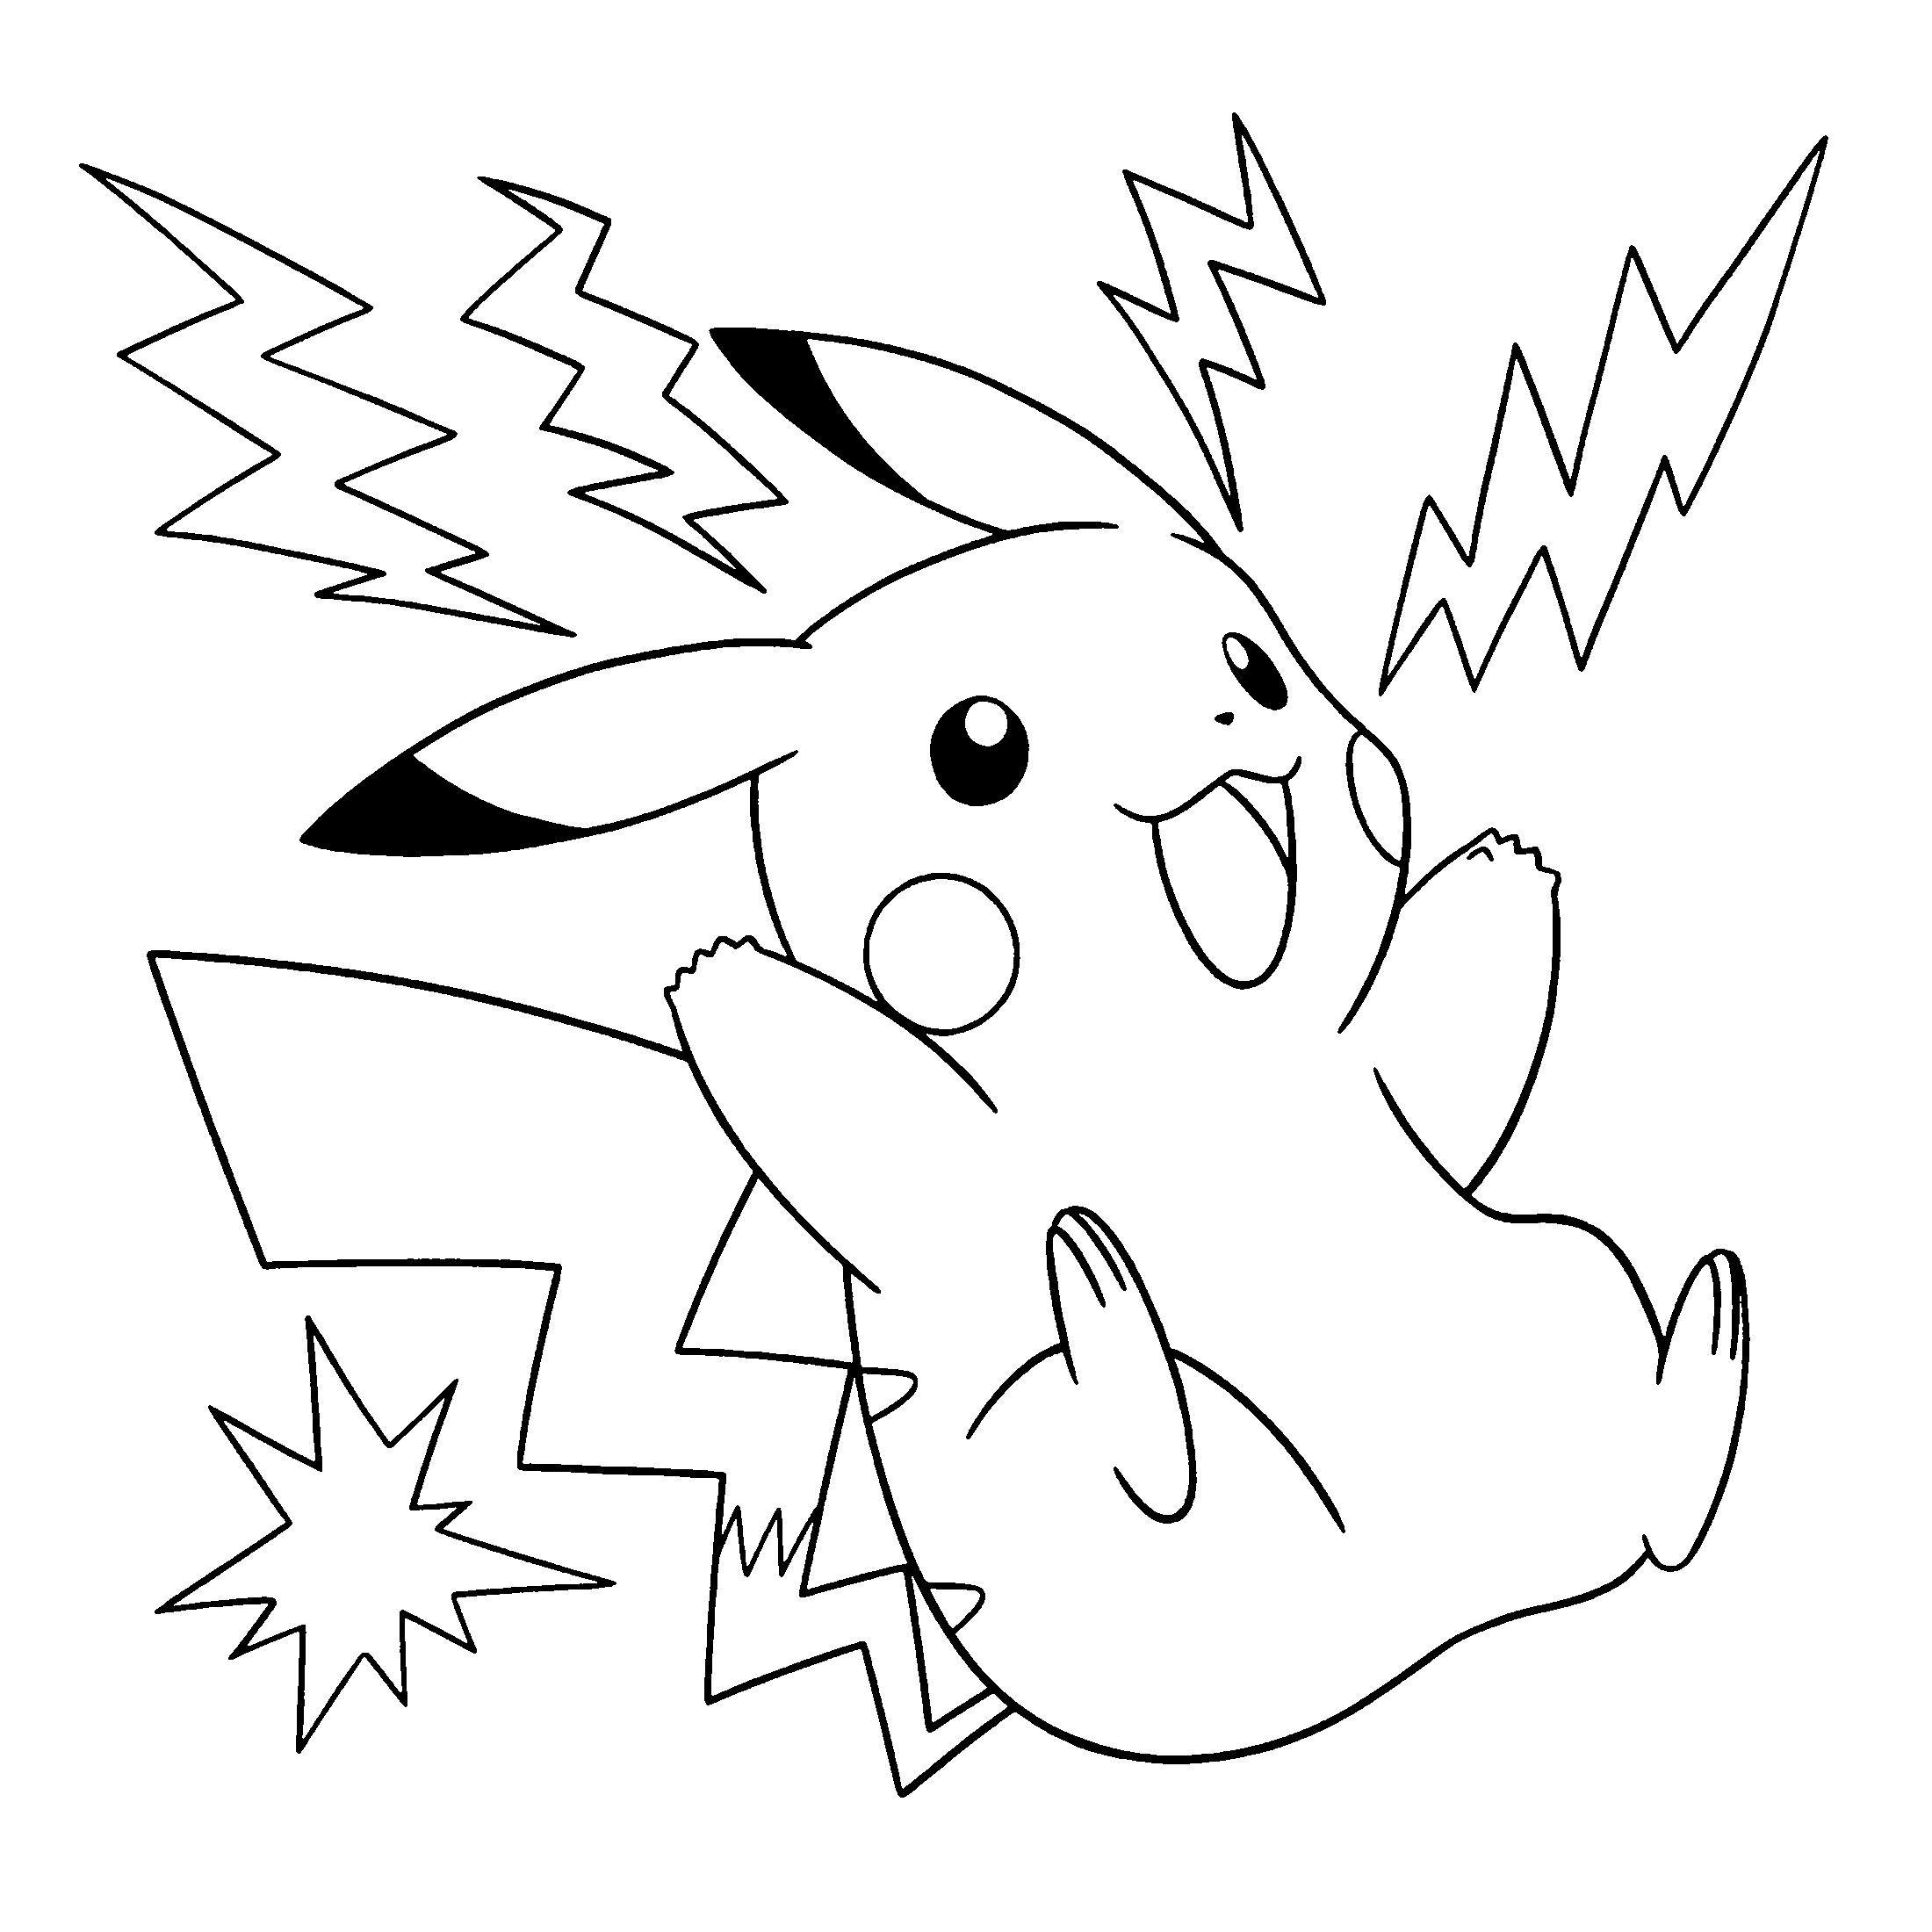 Dibujos Pikachu Para Dibujar Imprimir Colorear Y